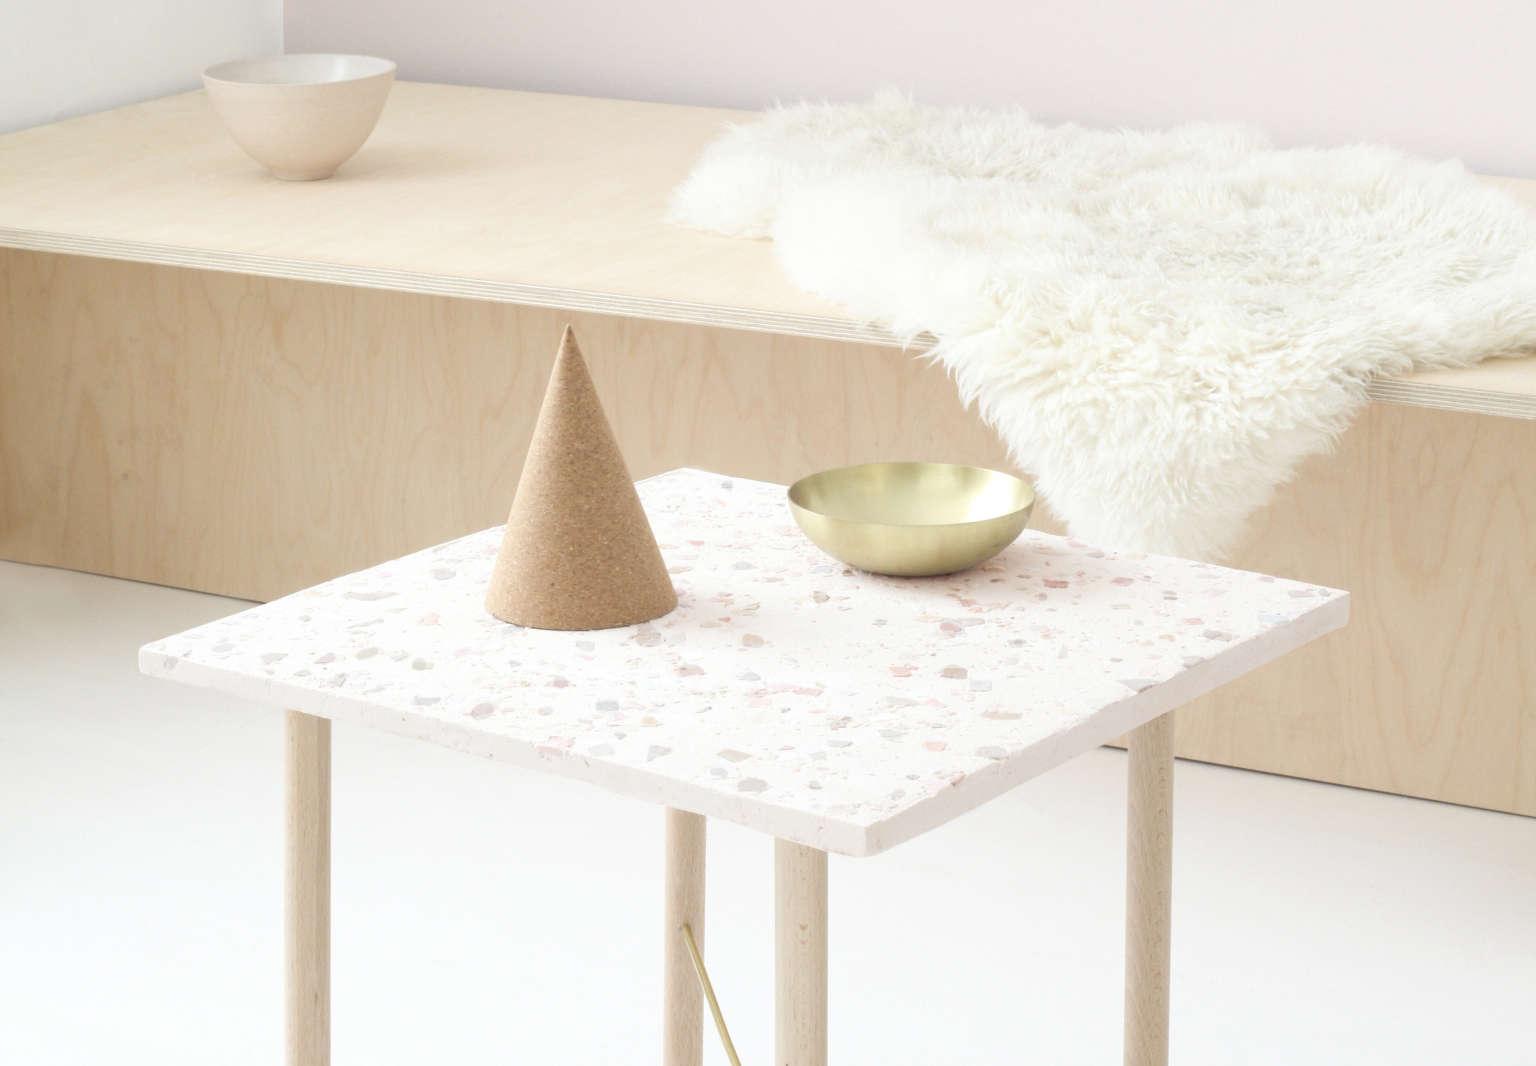 diy terrazzo table by heju paris 2